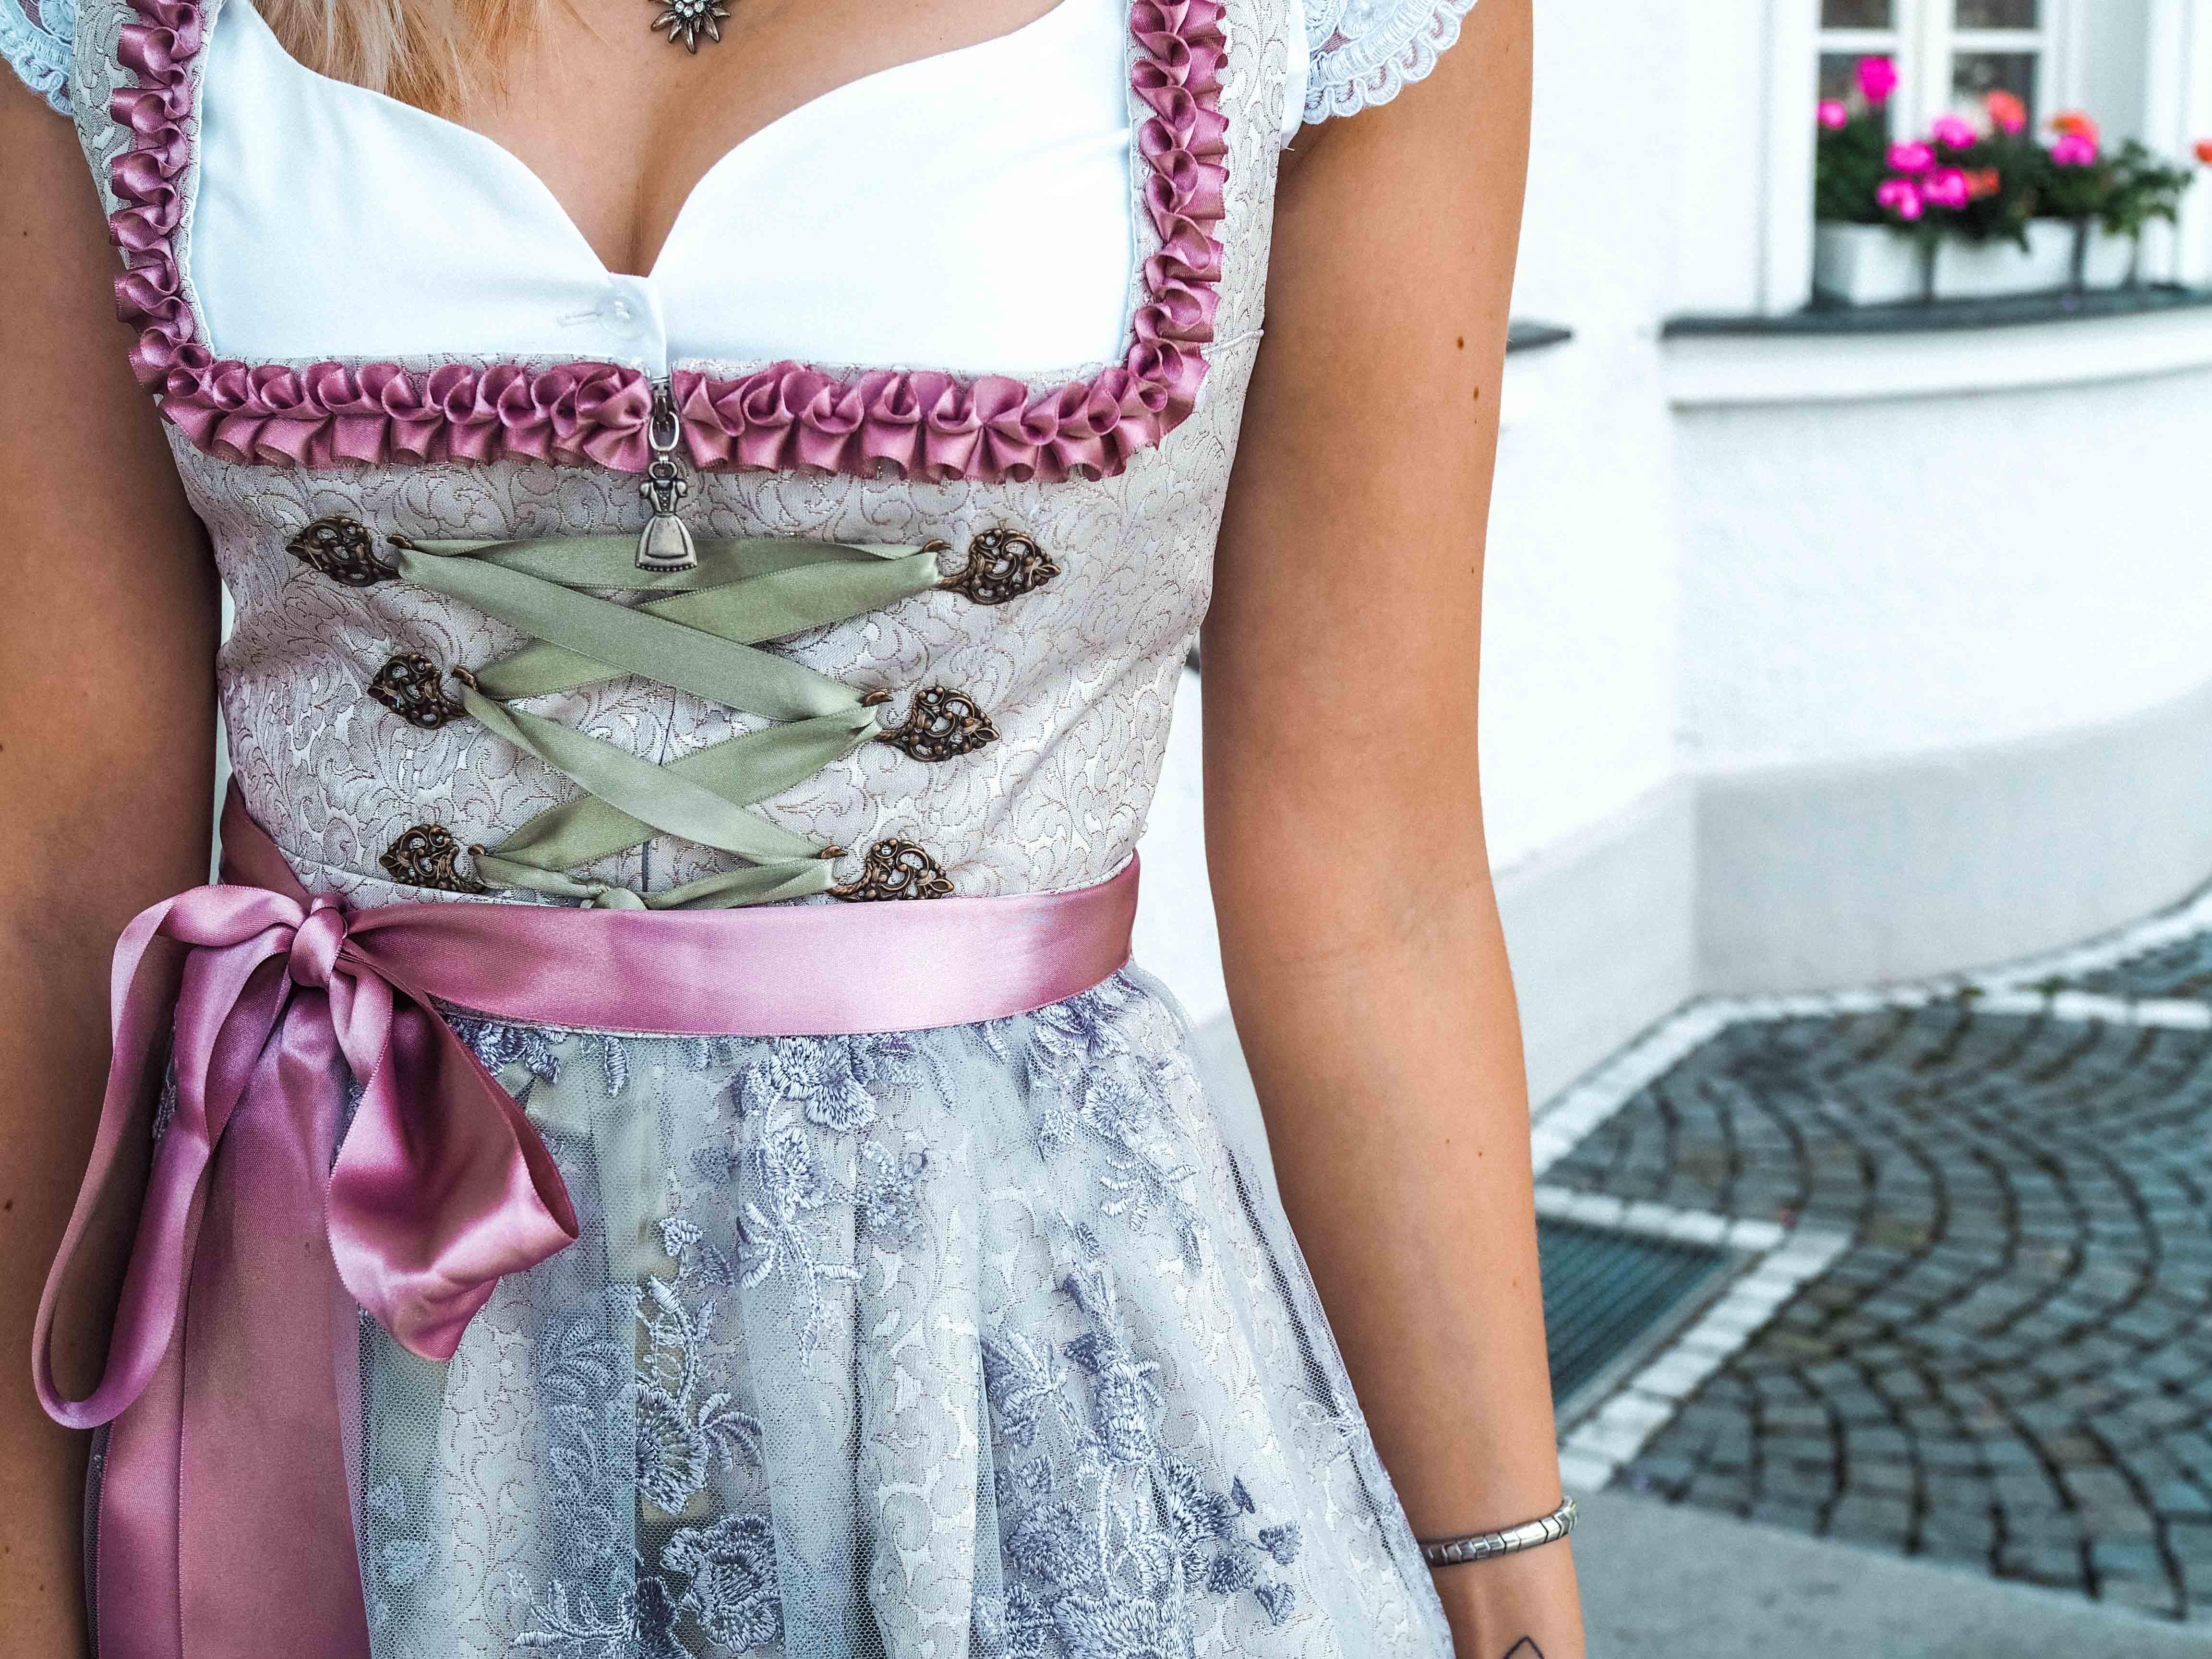 Dirndl, Tracht, Katefully, Fashionblog, Modeblog, München, Oktoberfest Outfit, Wiesn, Trachtenoutfit, Wiesnoutfit, Dirndl kombinieren, Schleife, Schleife binden